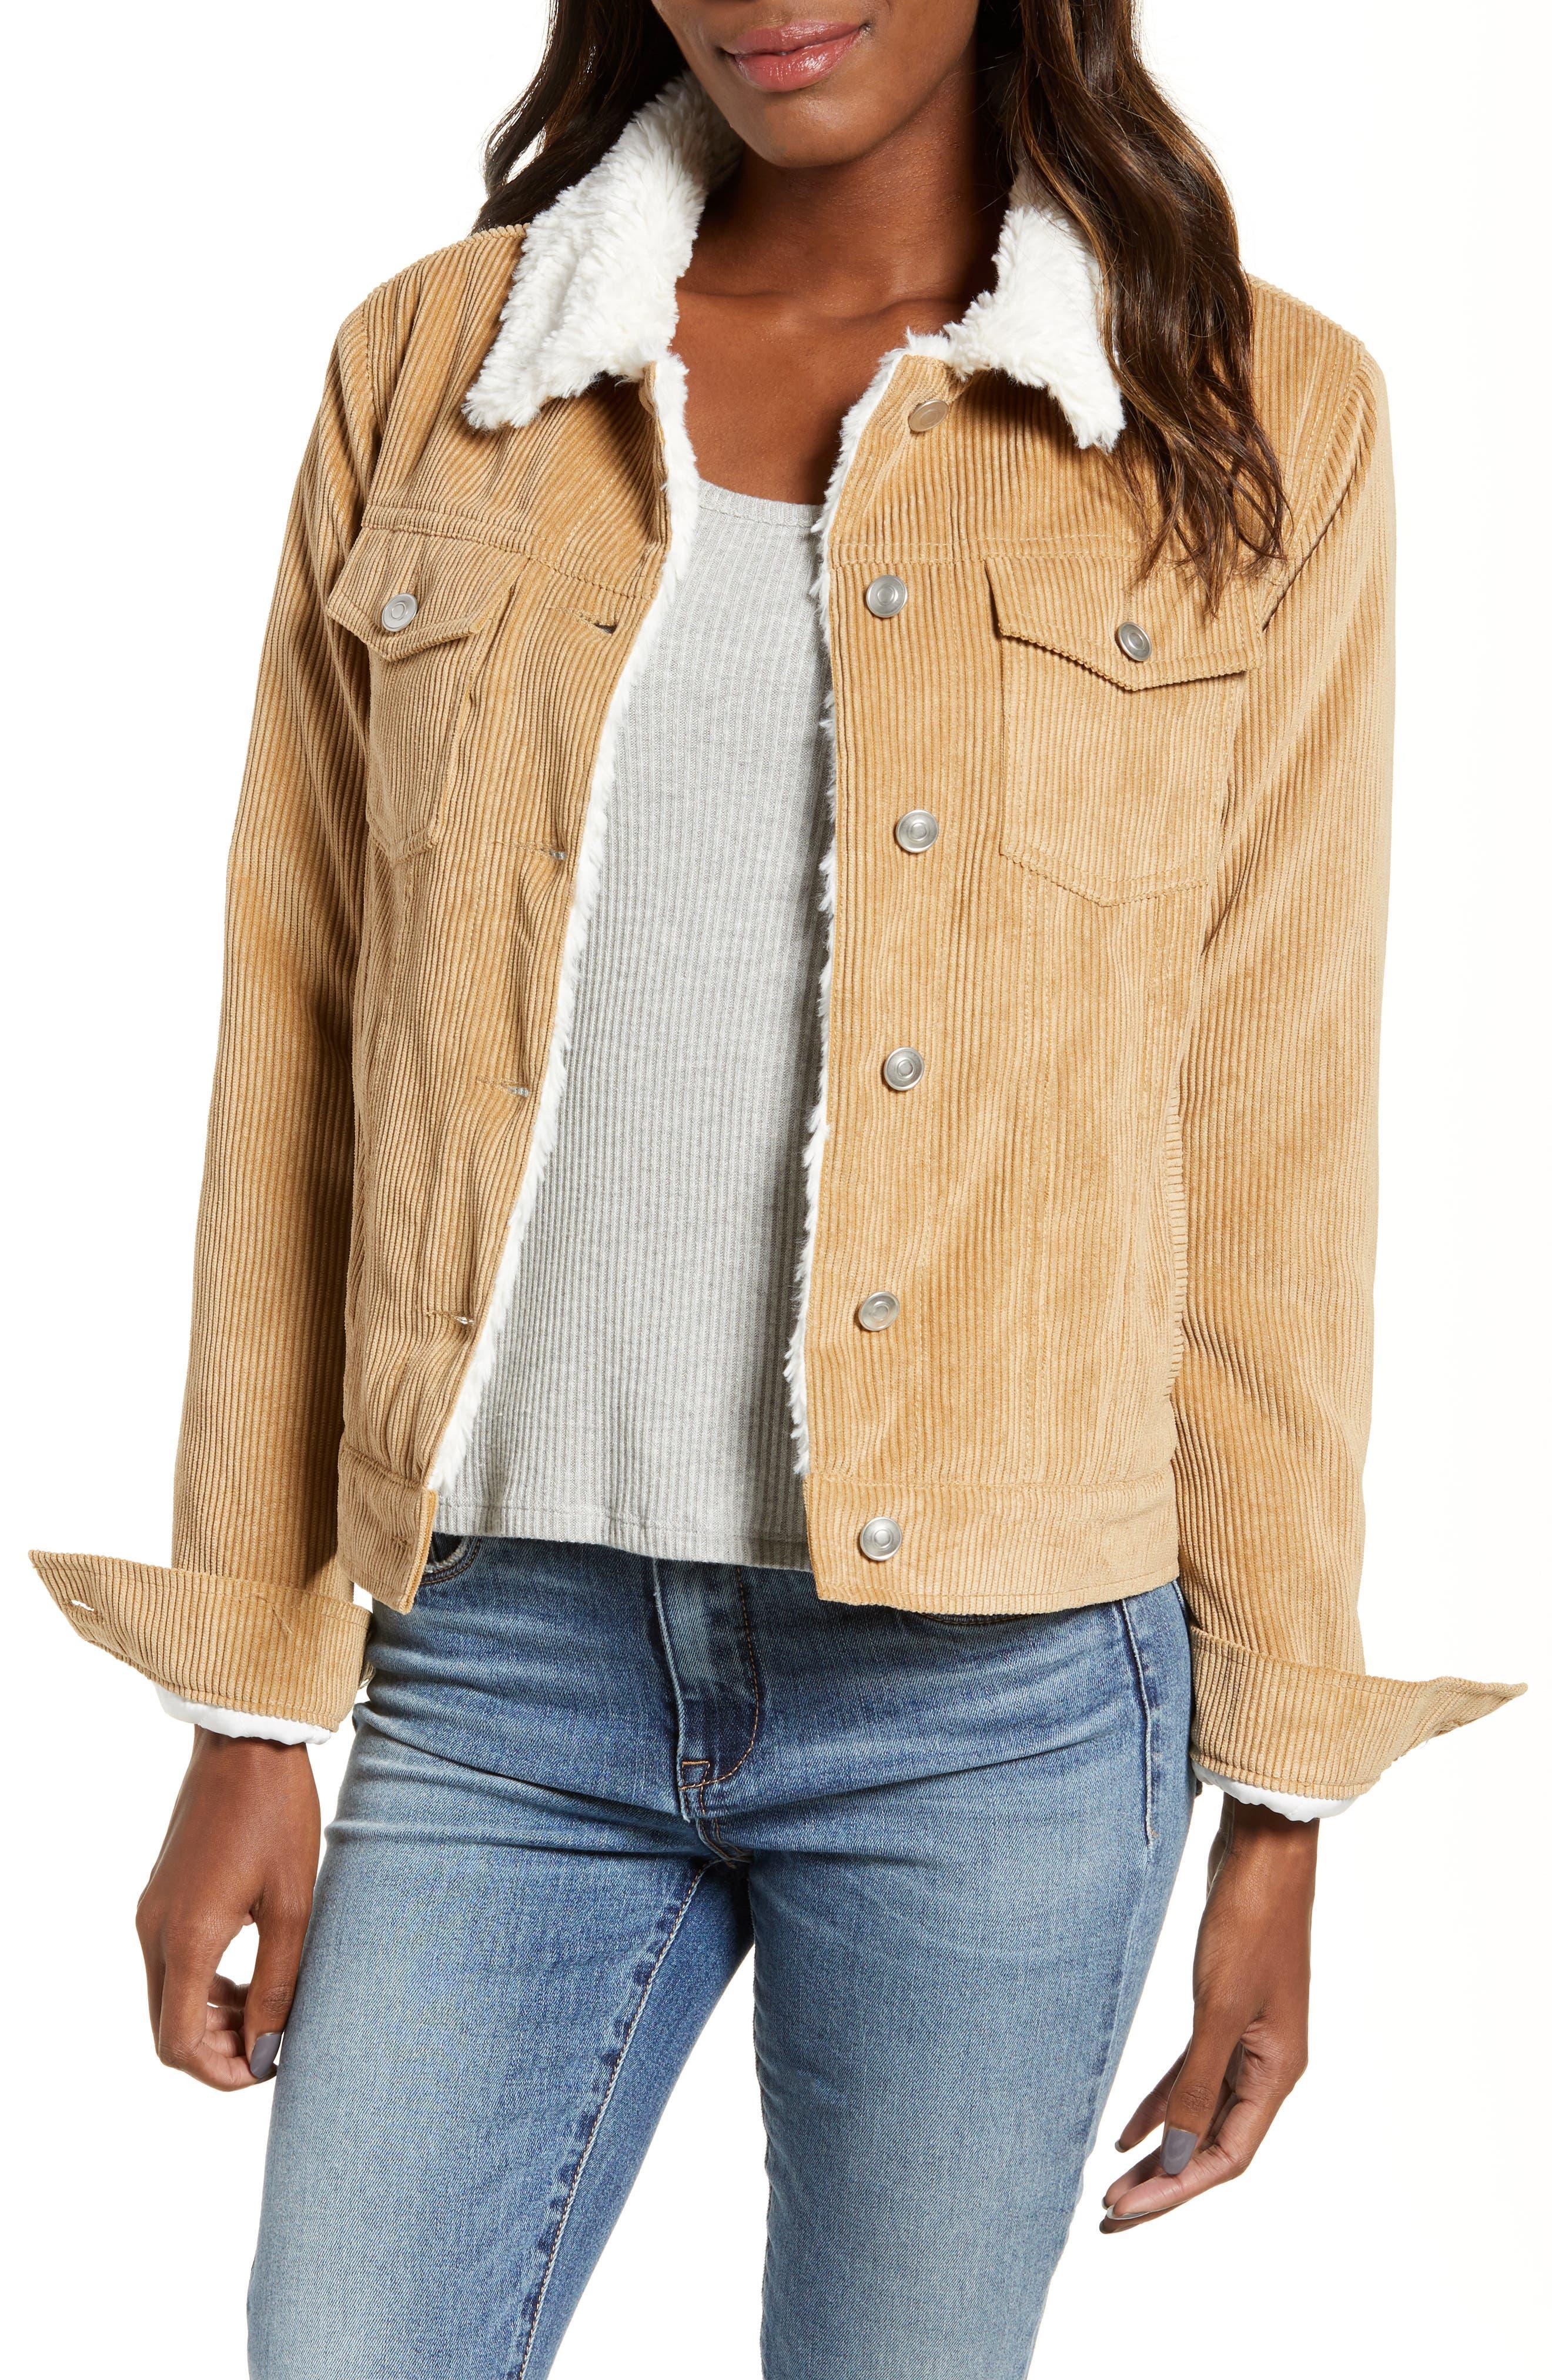 THREAD & SUPPLY, Paddington Fleece Lined Corduroy Jacket, Main thumbnail 1, color, KHAKI